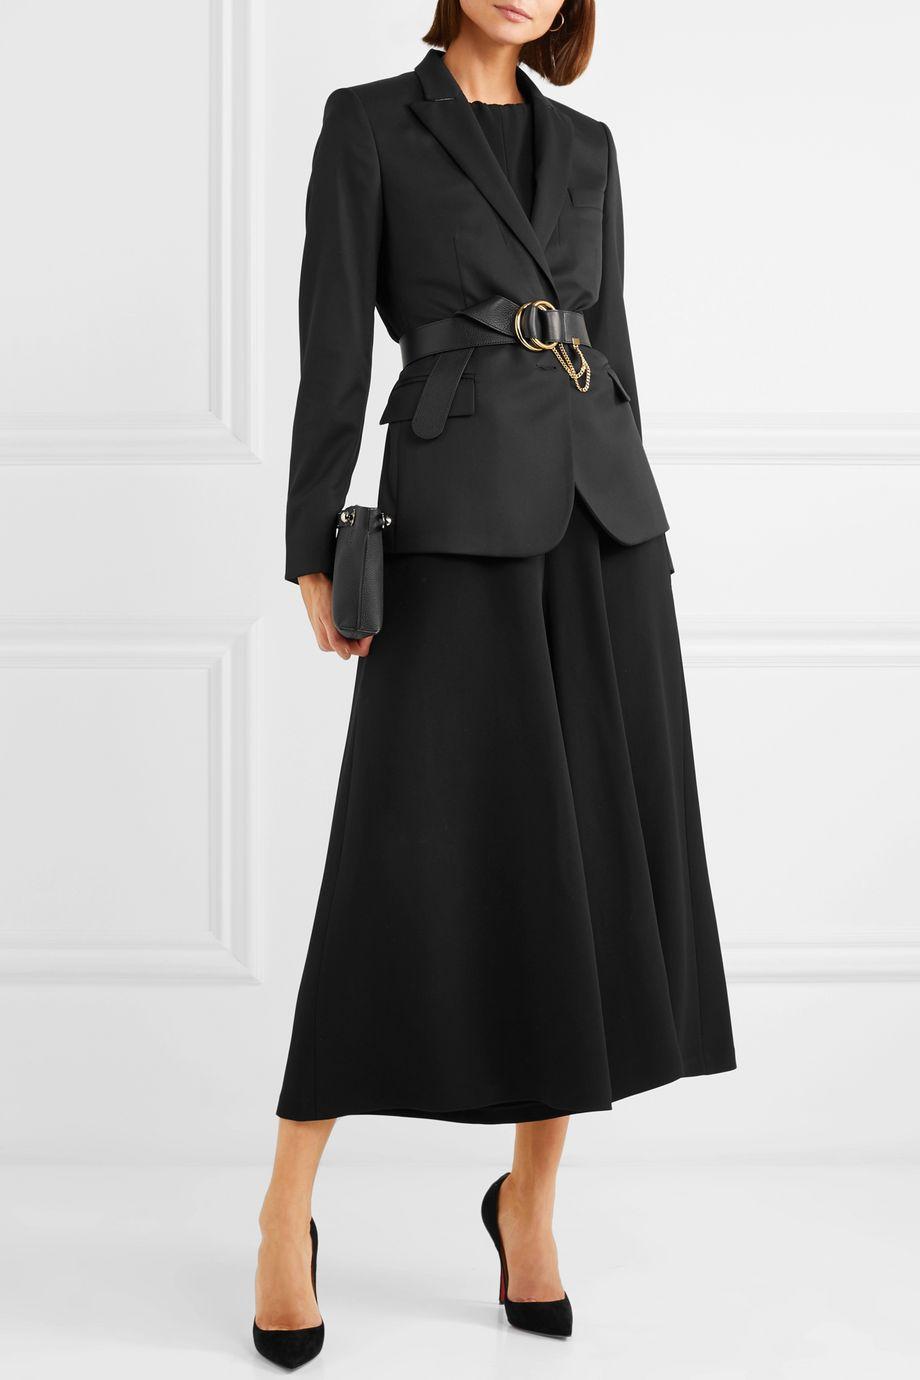 Stella McCartney Ingrid 羊毛西装外套